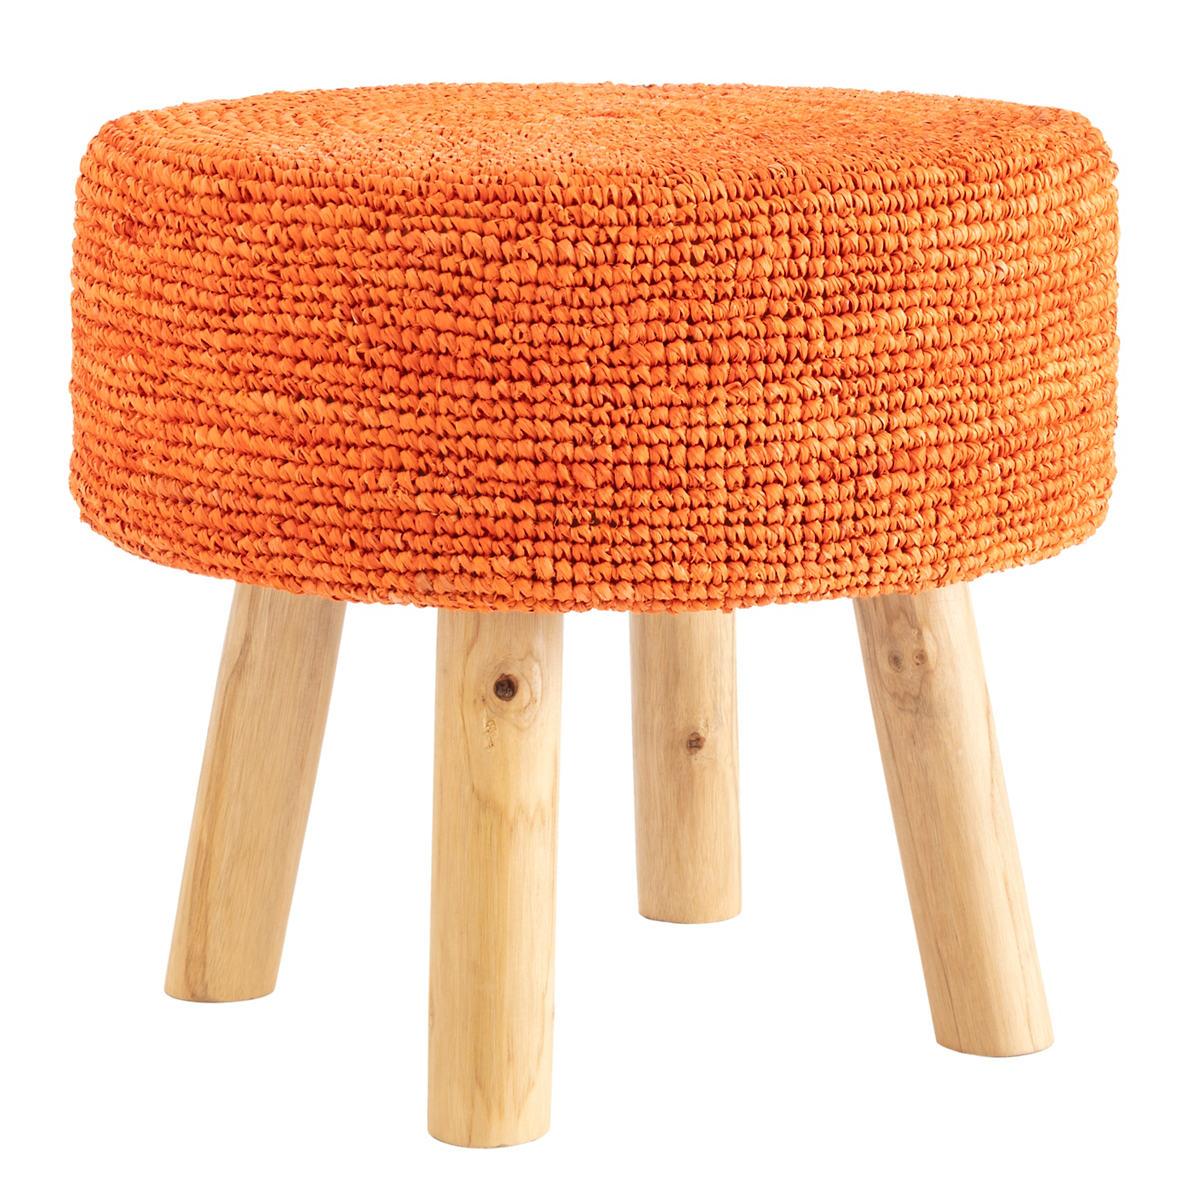 Fiesta Tangerine Stool